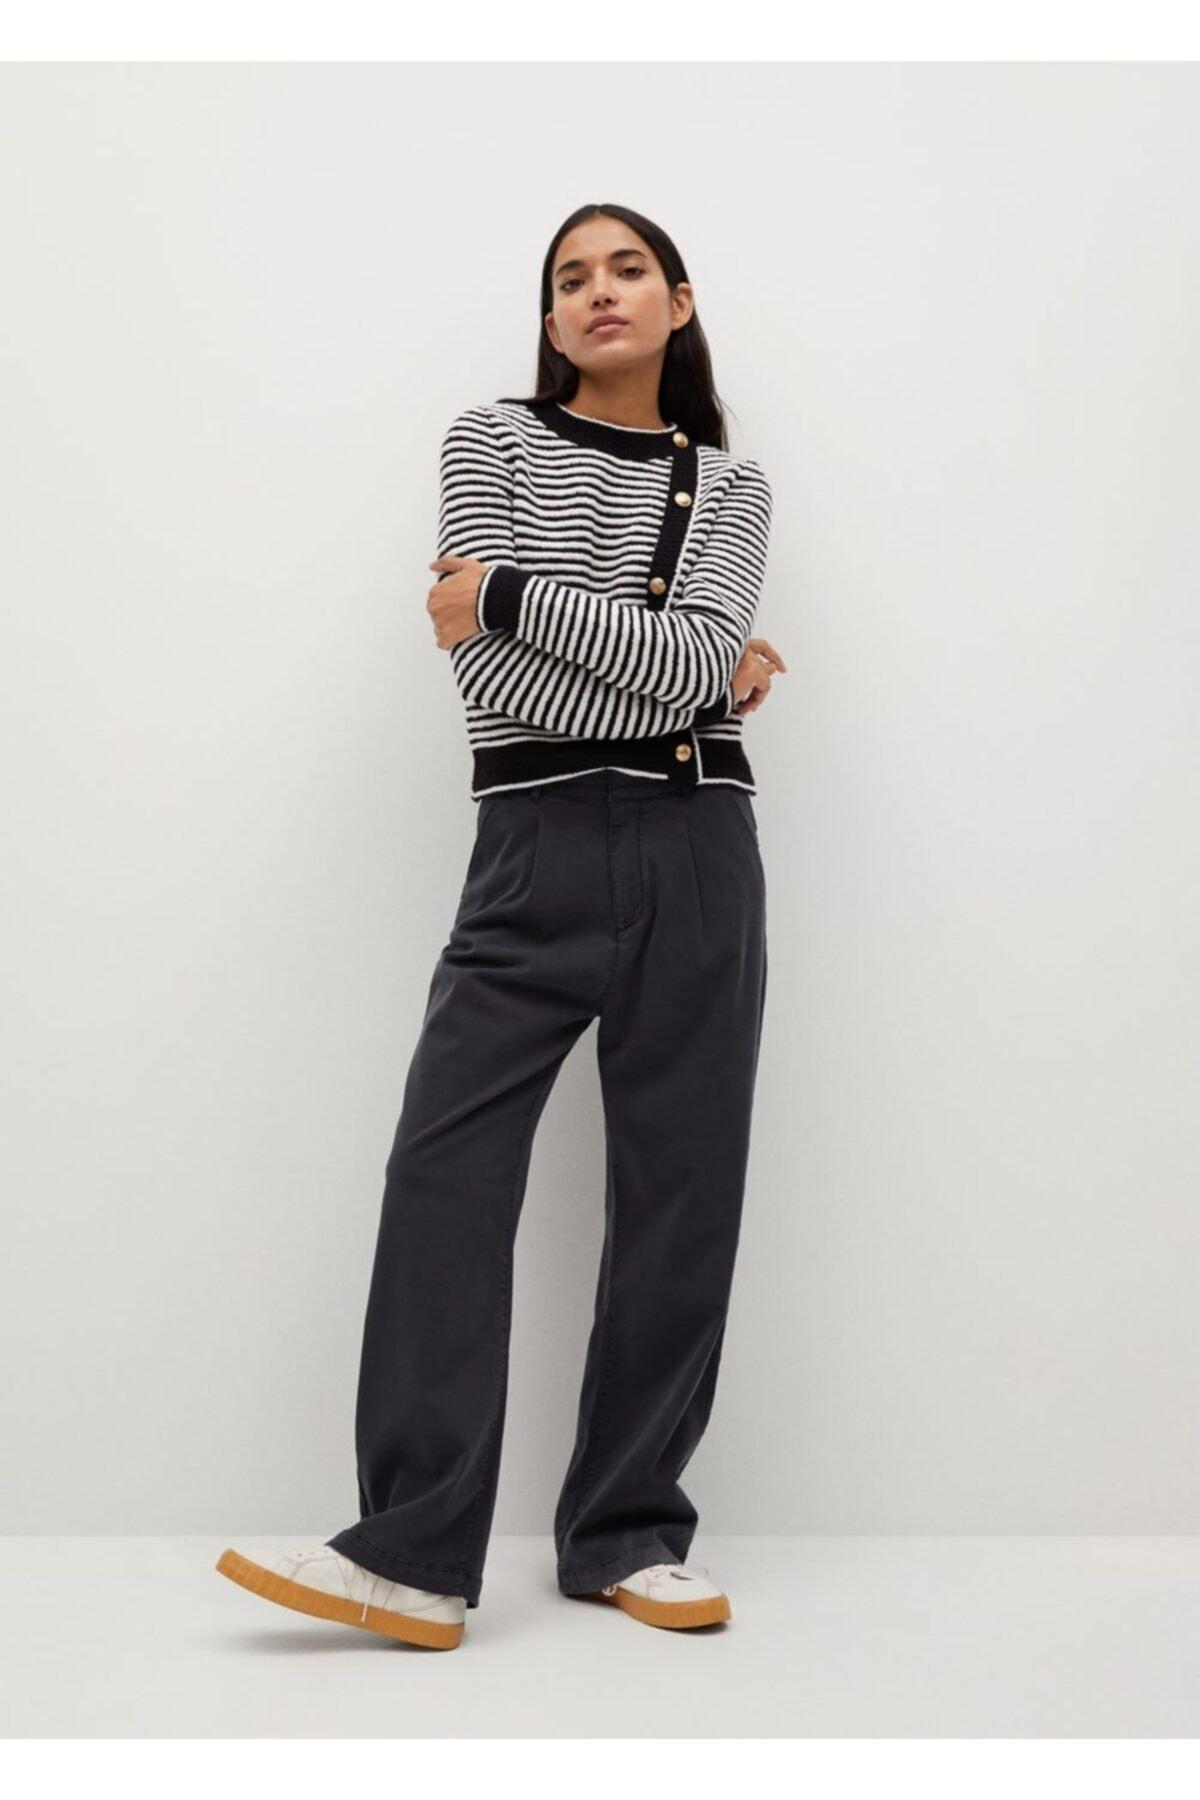 Mango Pili Detaylı Pamuklu Pantolon